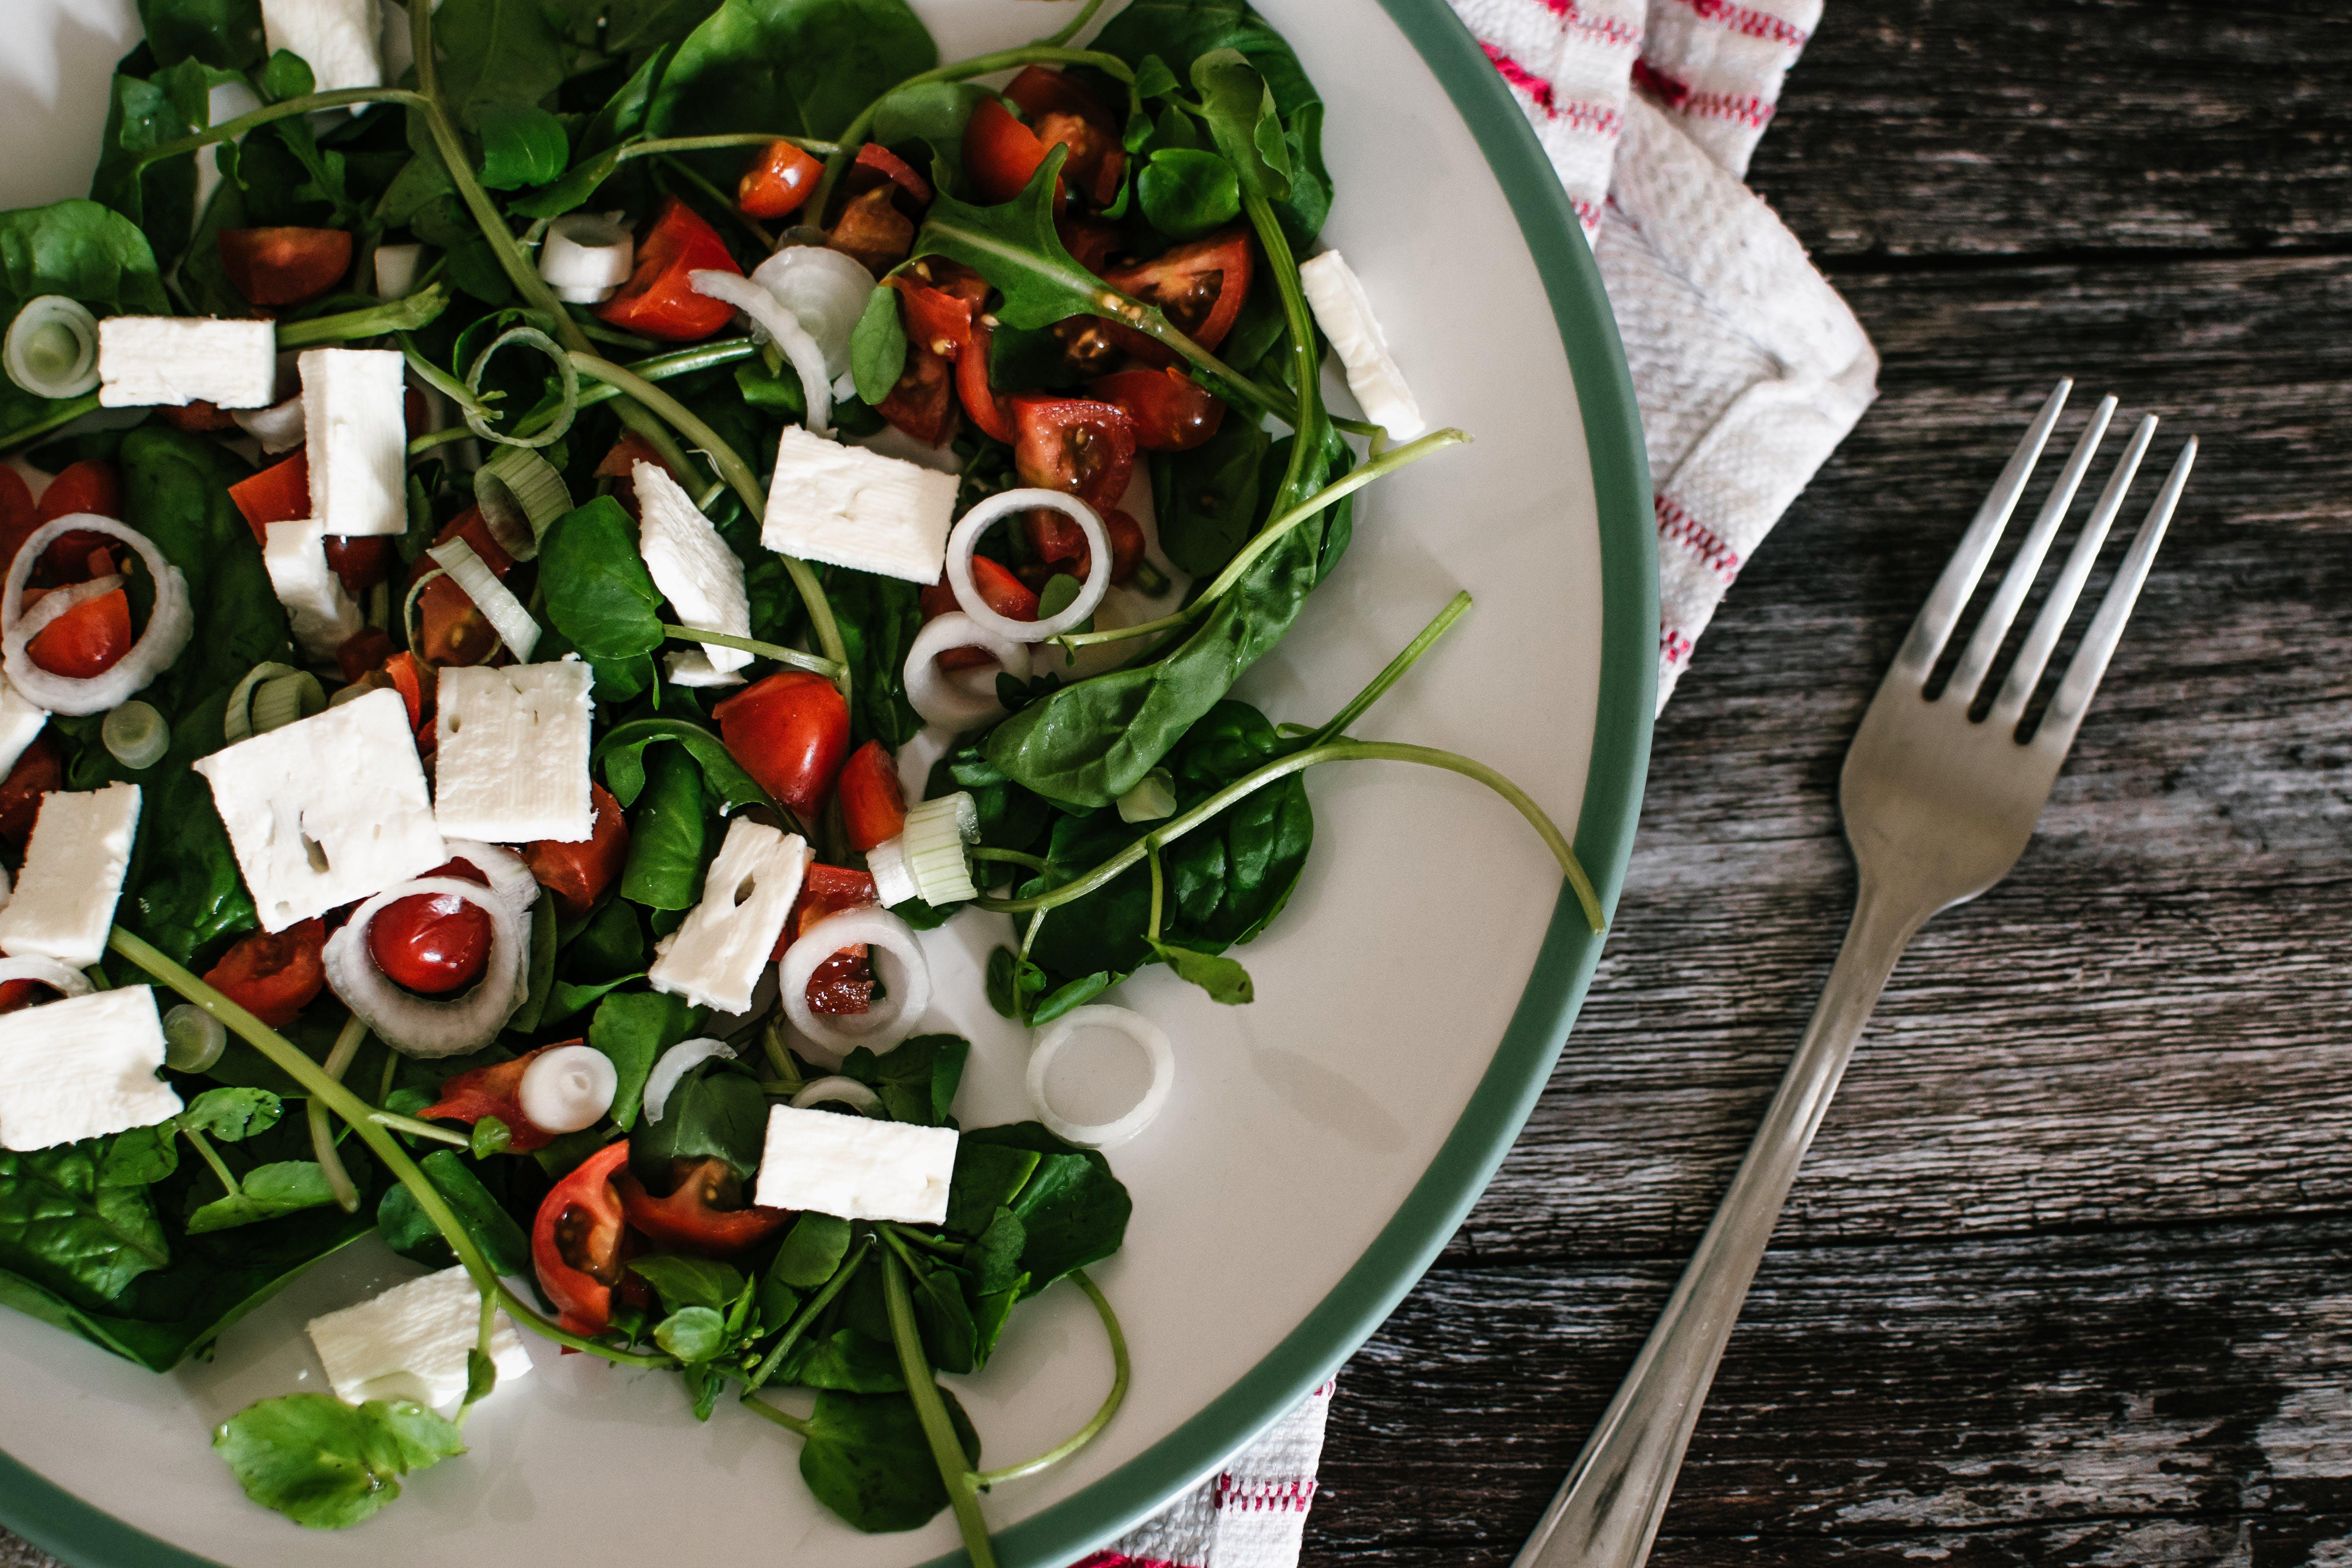 Vegetable Salad on White Ceramic Plate Beside Grey Stainless Steel Fork